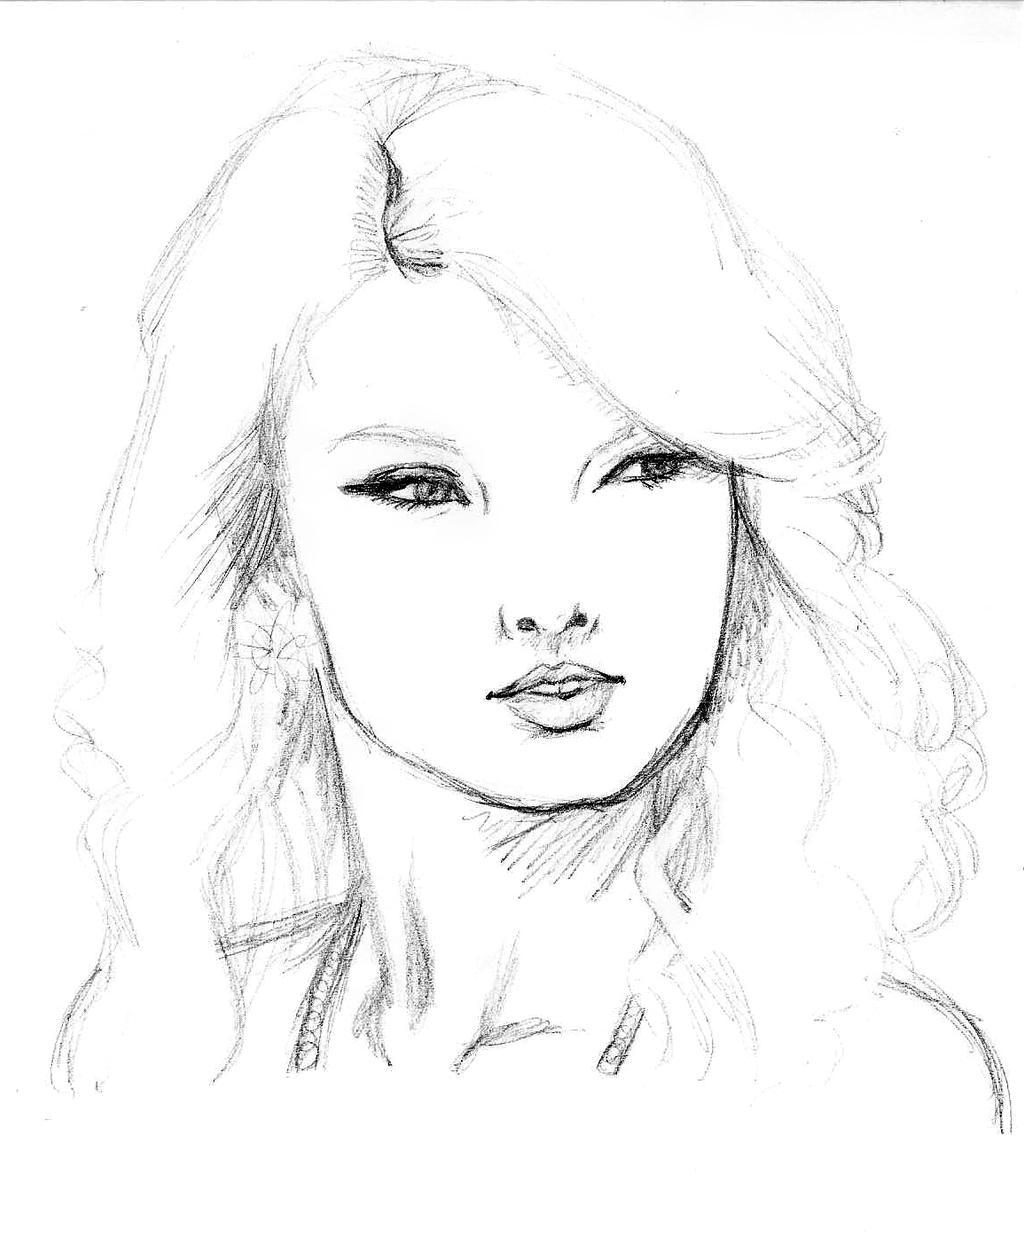 Taylor Swift Sketch By Dariosuper On Deviantart